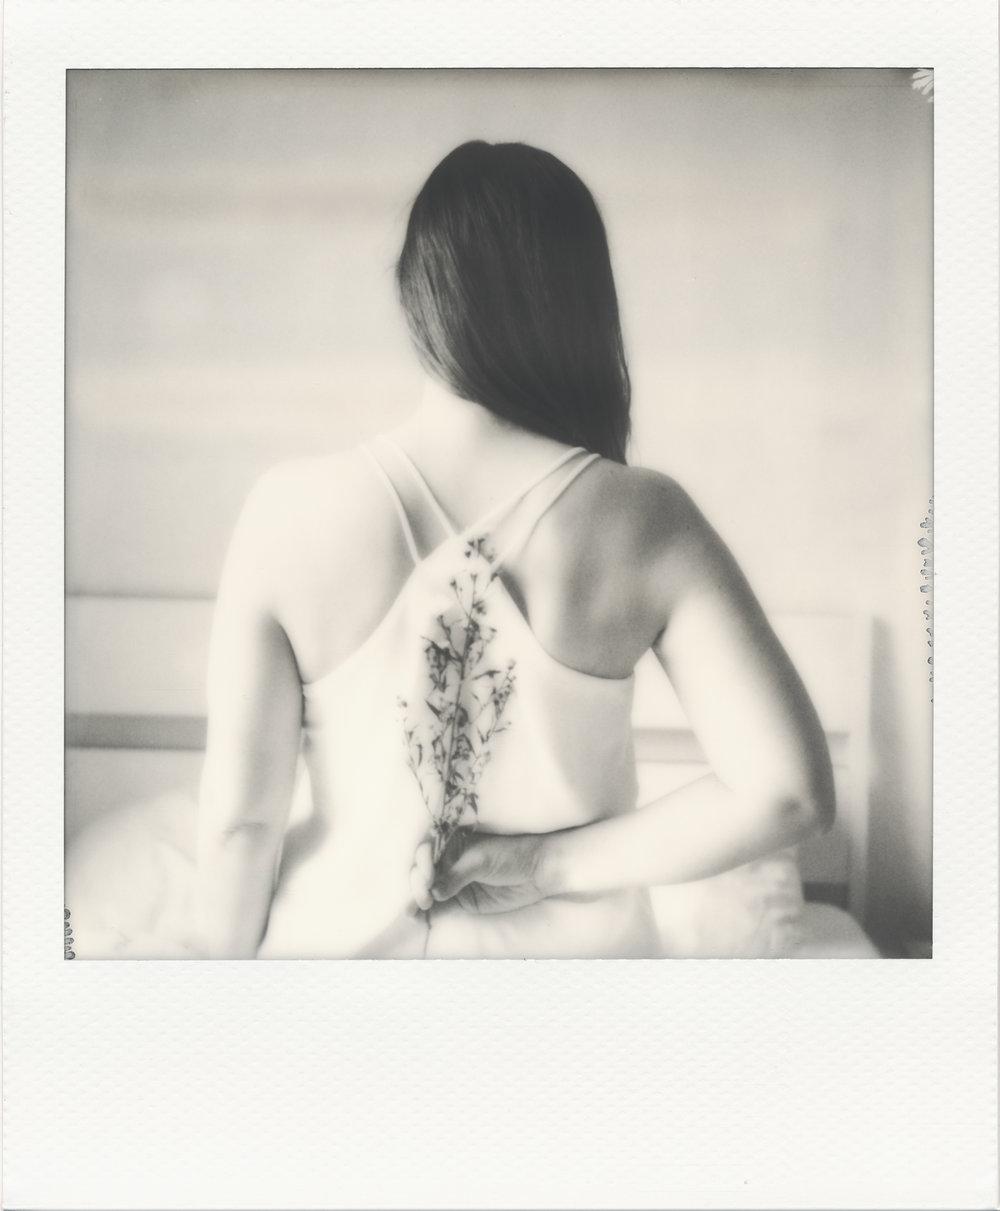 Jennifer_Rumbach_Polaroids_SW_190408_01.jpg